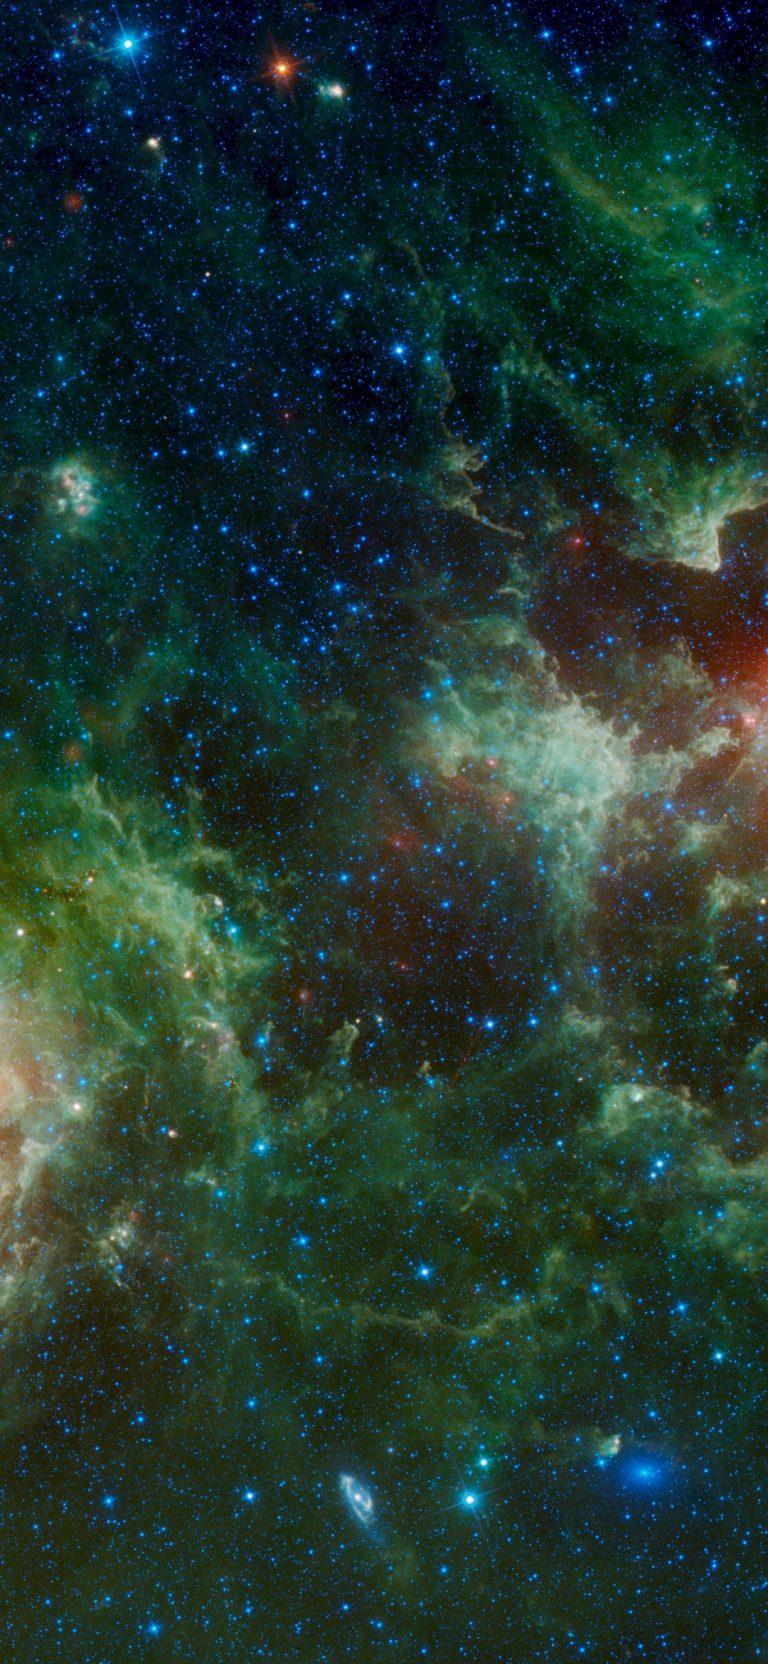 Space Phone Wallpaper 219 1080x2340 768x1664